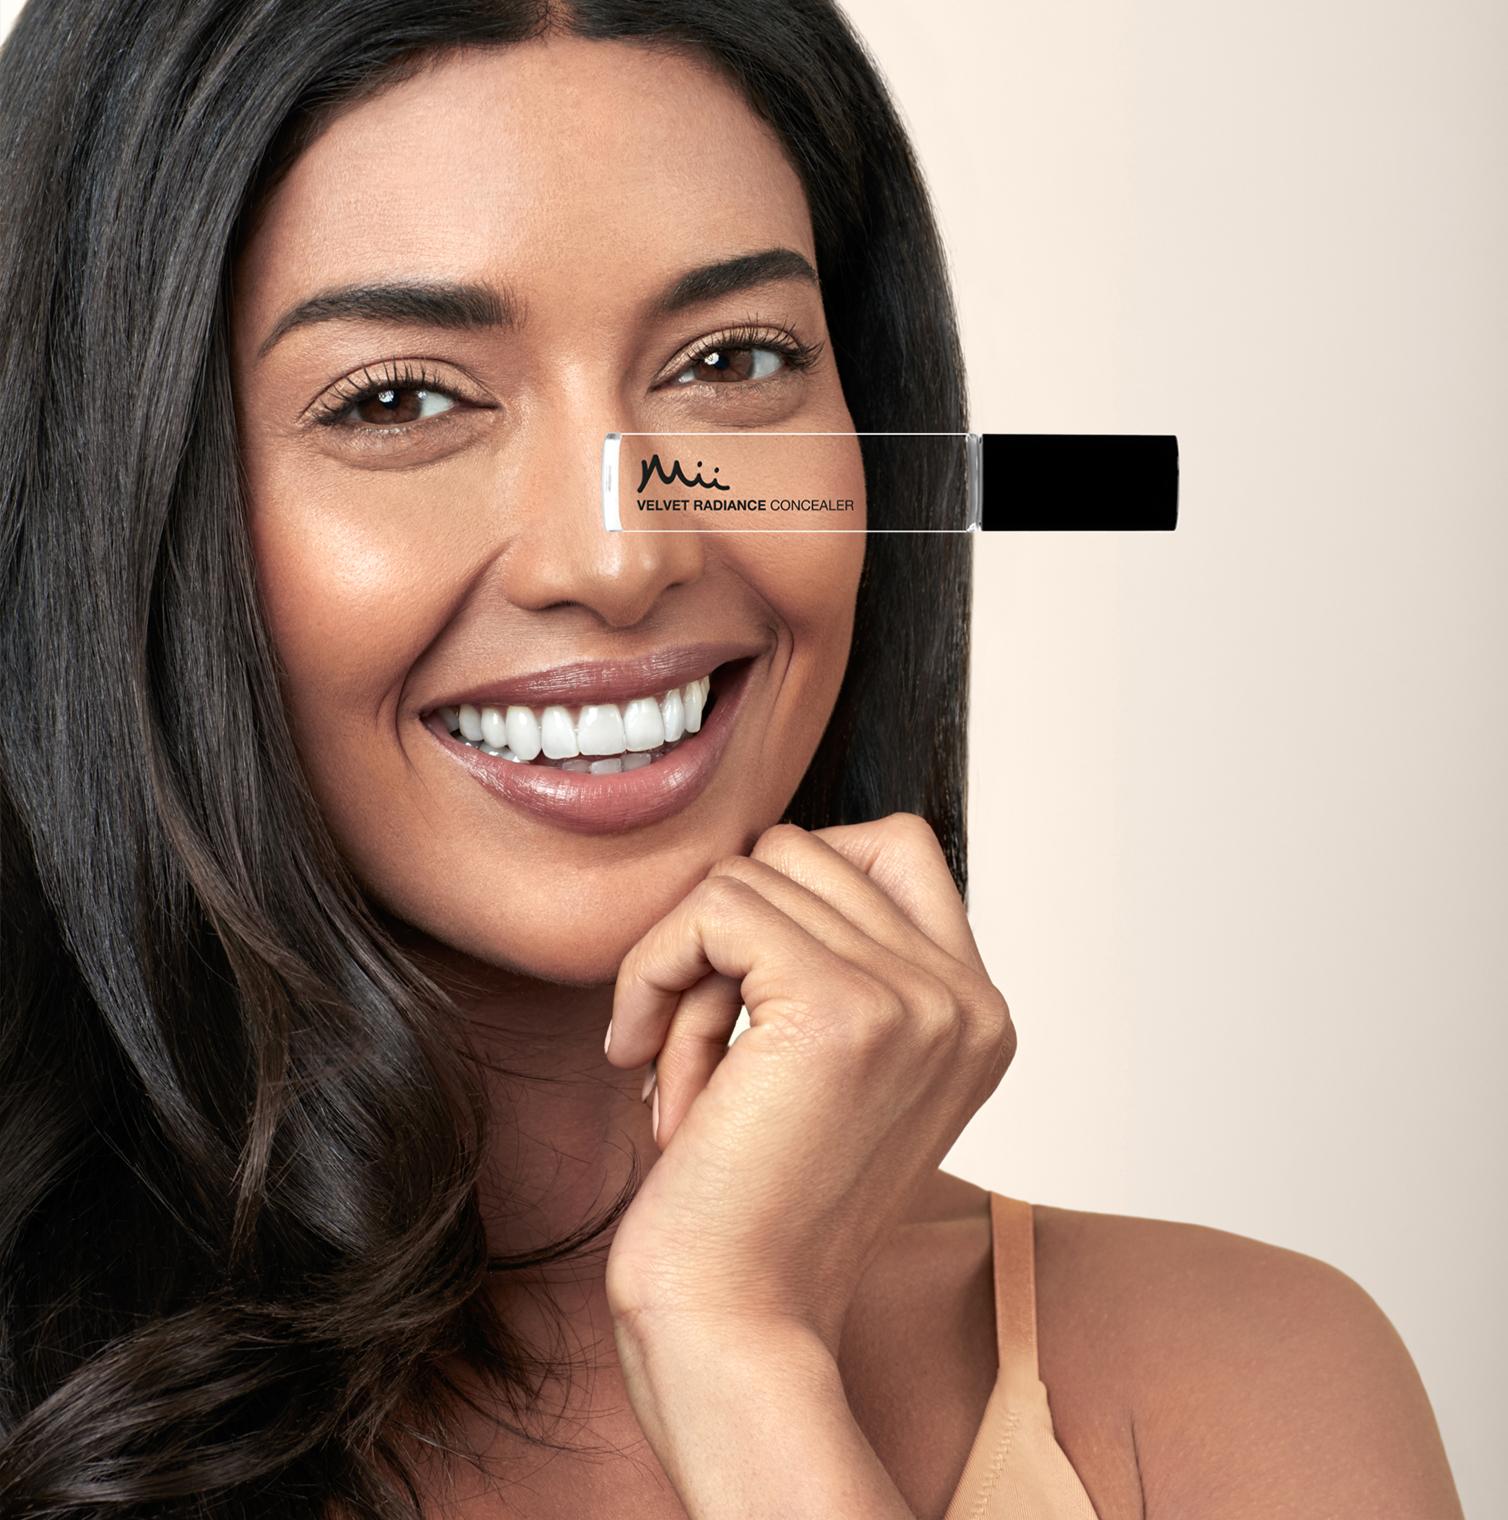 New Mii Cosmetics Velvet Radiance Concealer